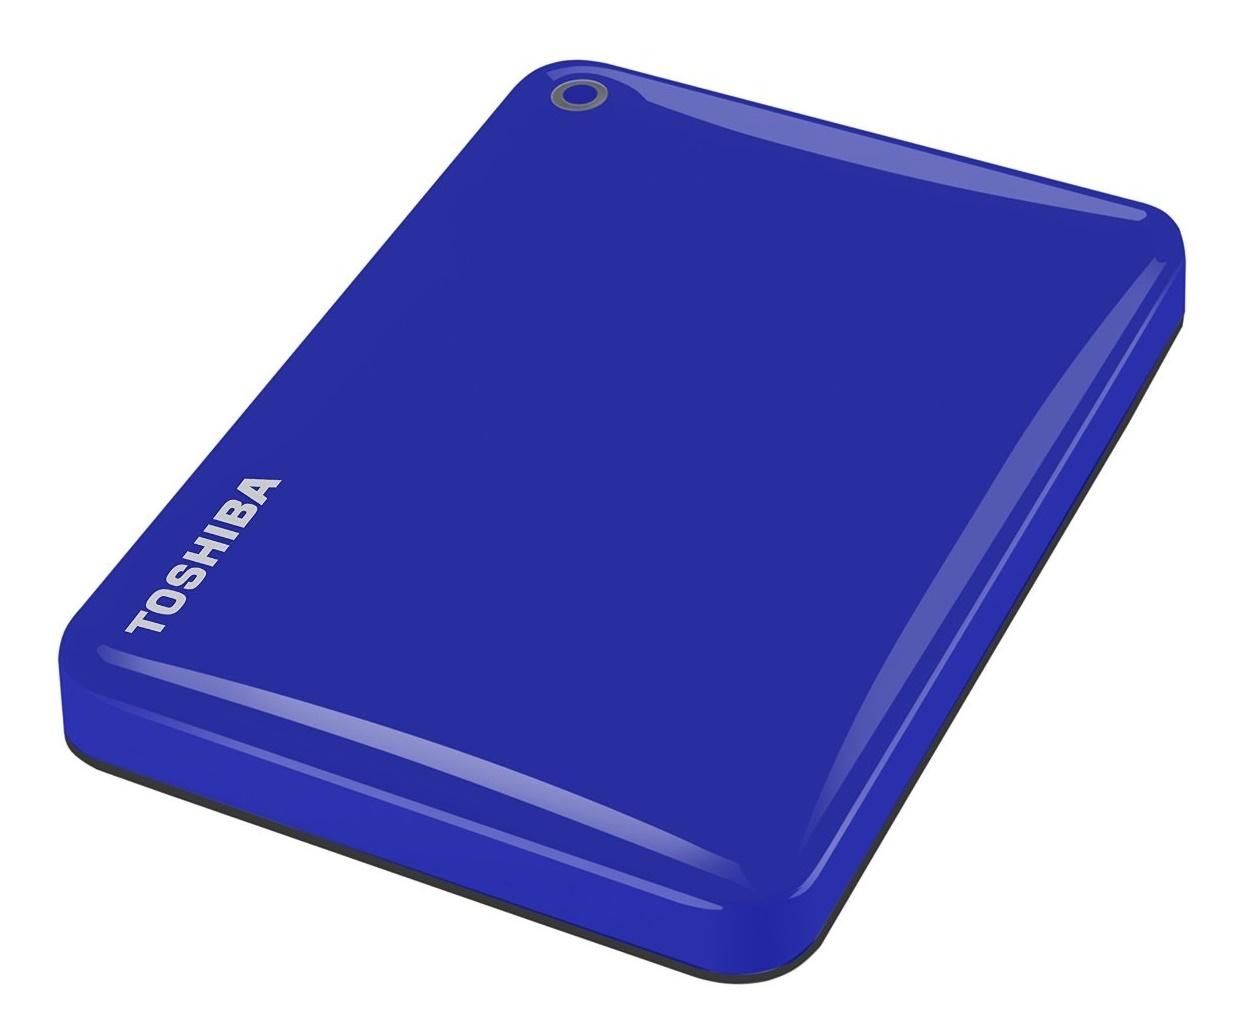 Toshiba desktop external hard drive ph3100u 1exb